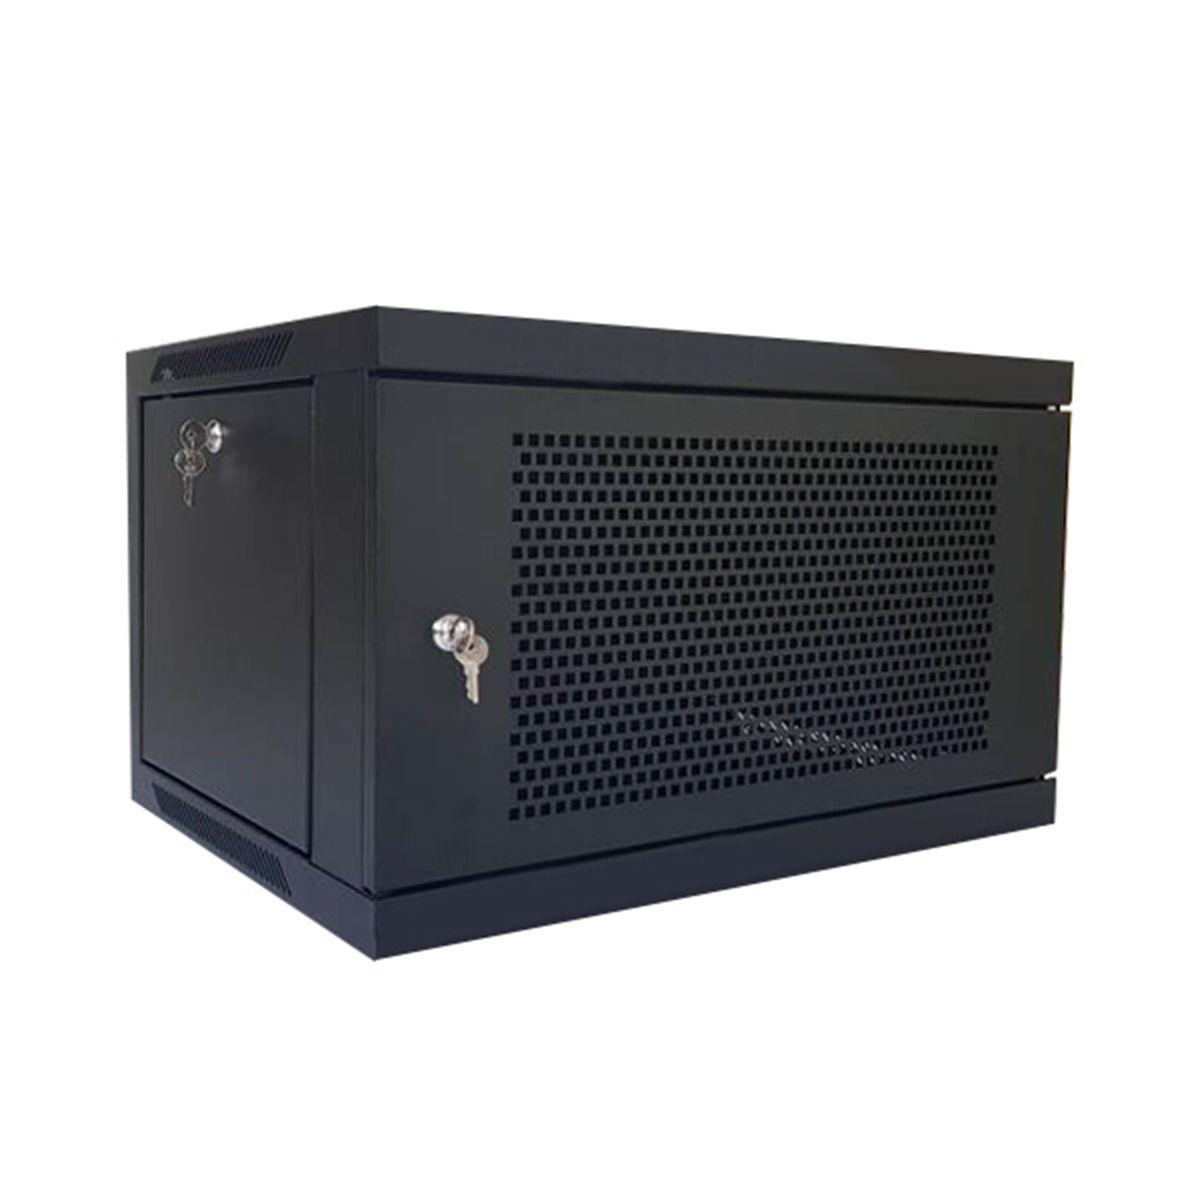 Rack gabinete de pared cerrado Wireplus de 9 U